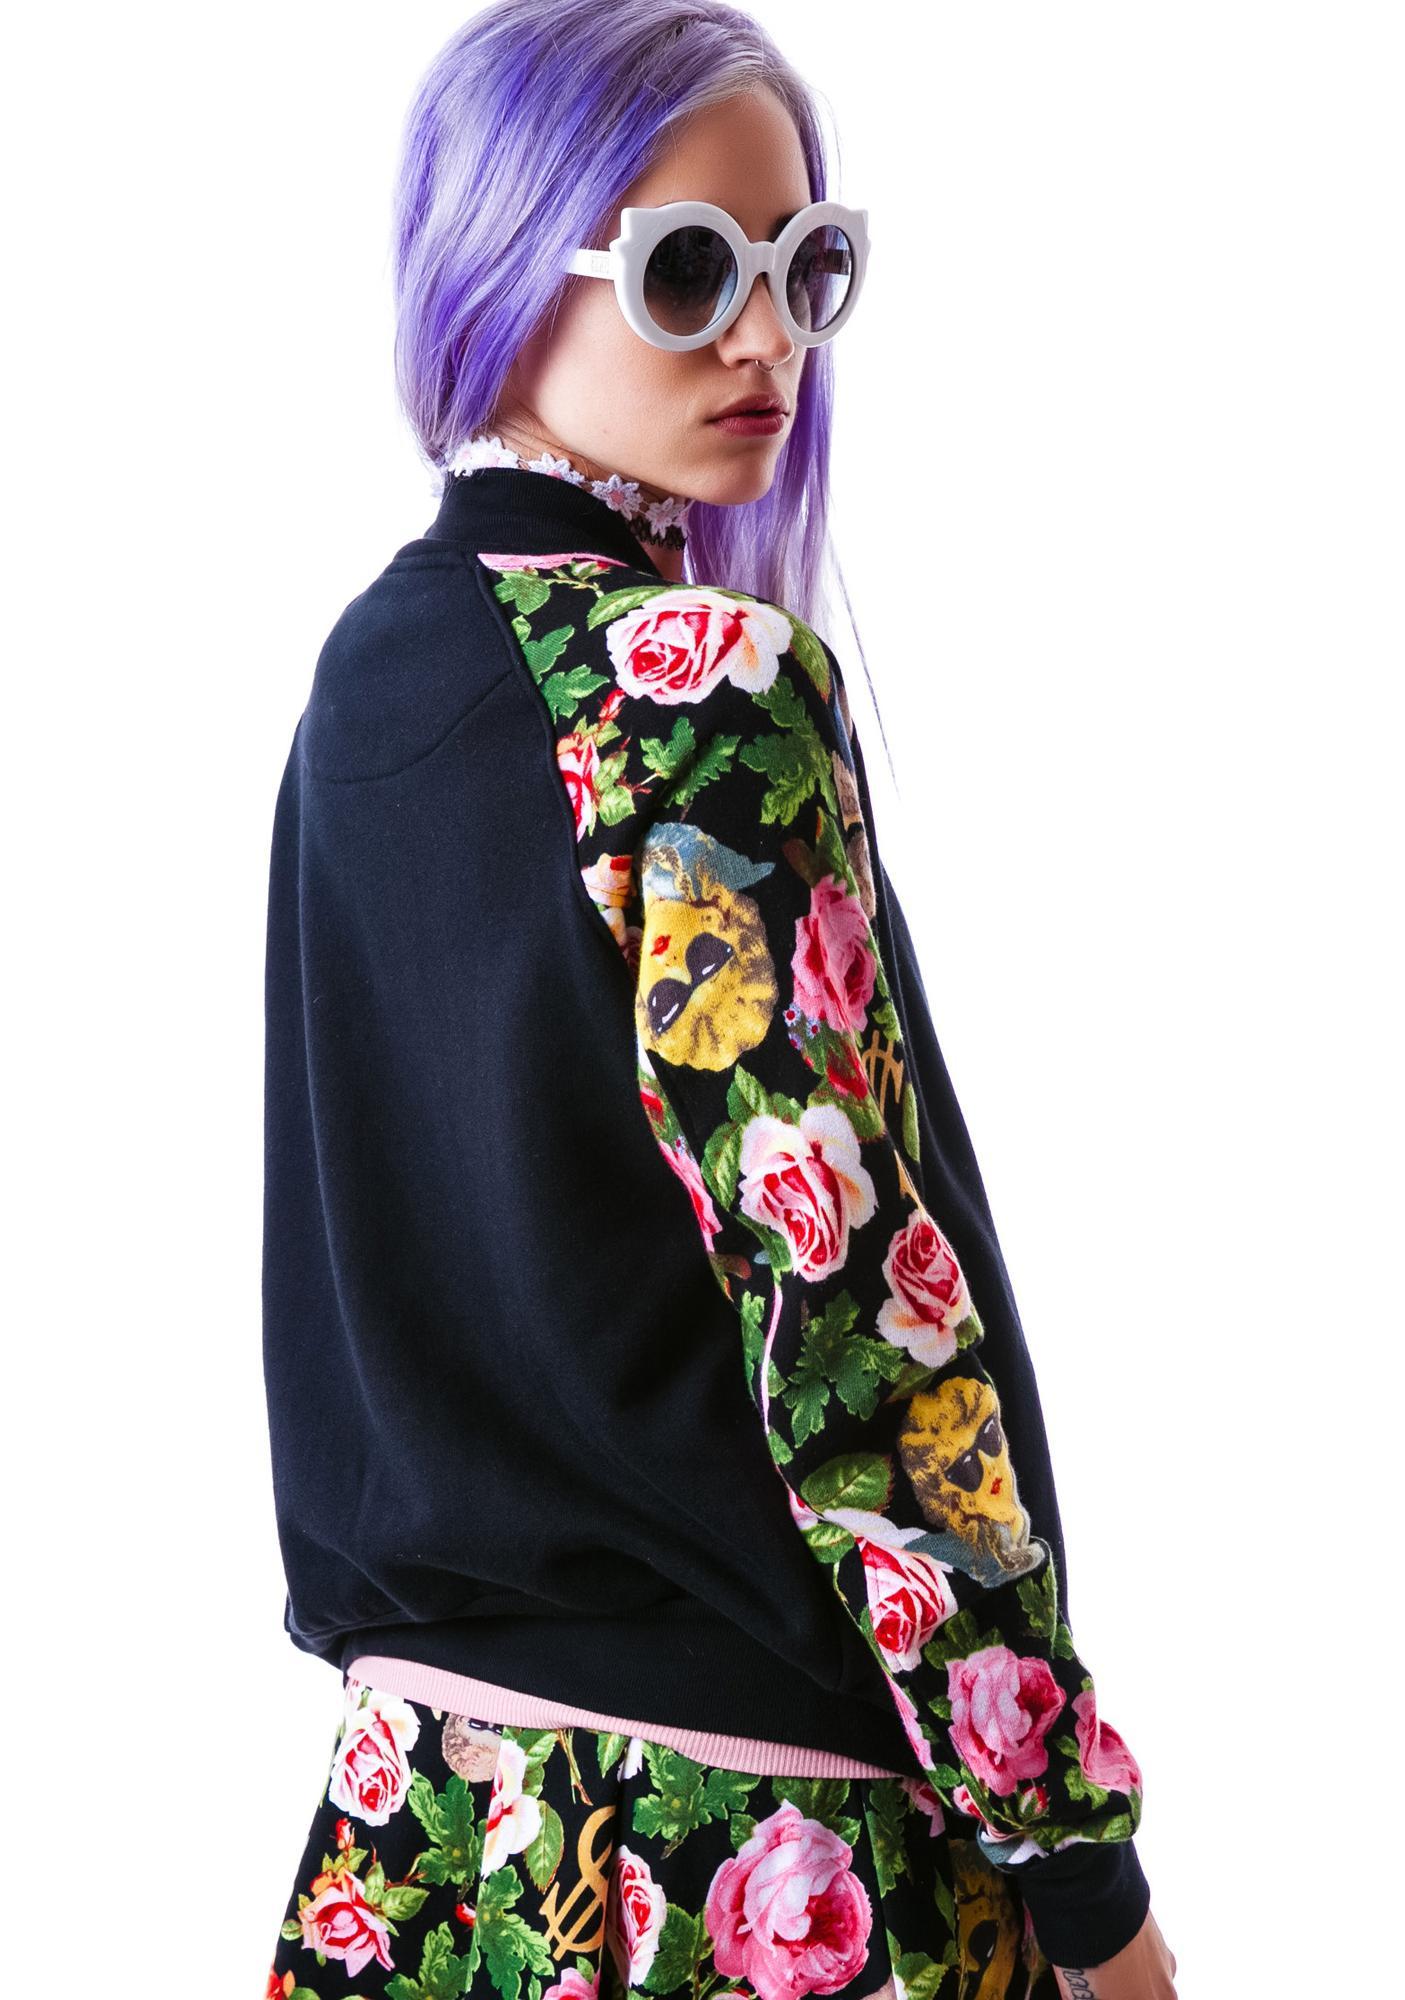 Joyrich Angelic Rich Floral Athletic Jacket